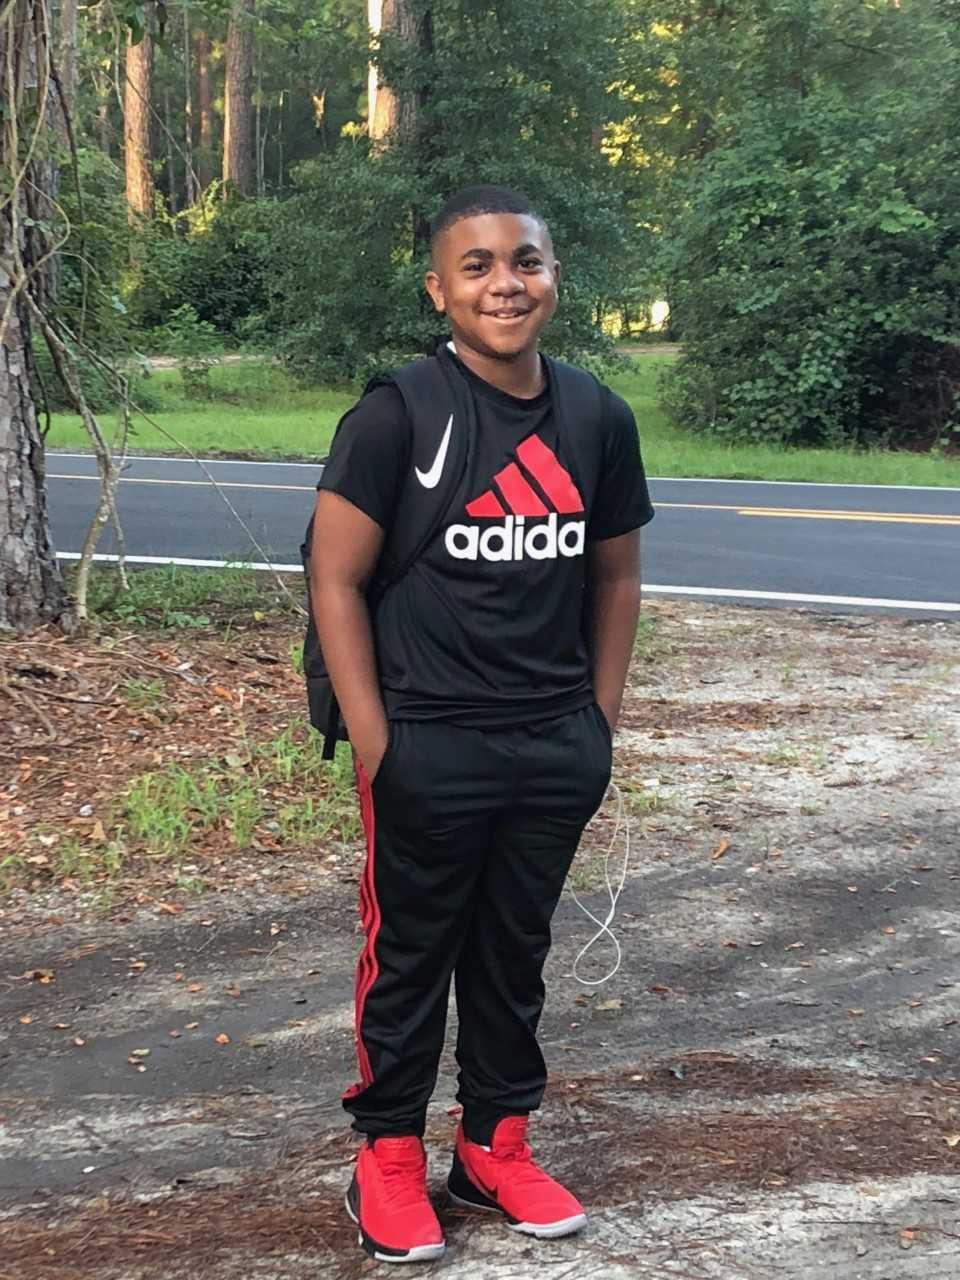 Bryce Thomas, 6th grade, BCMS.